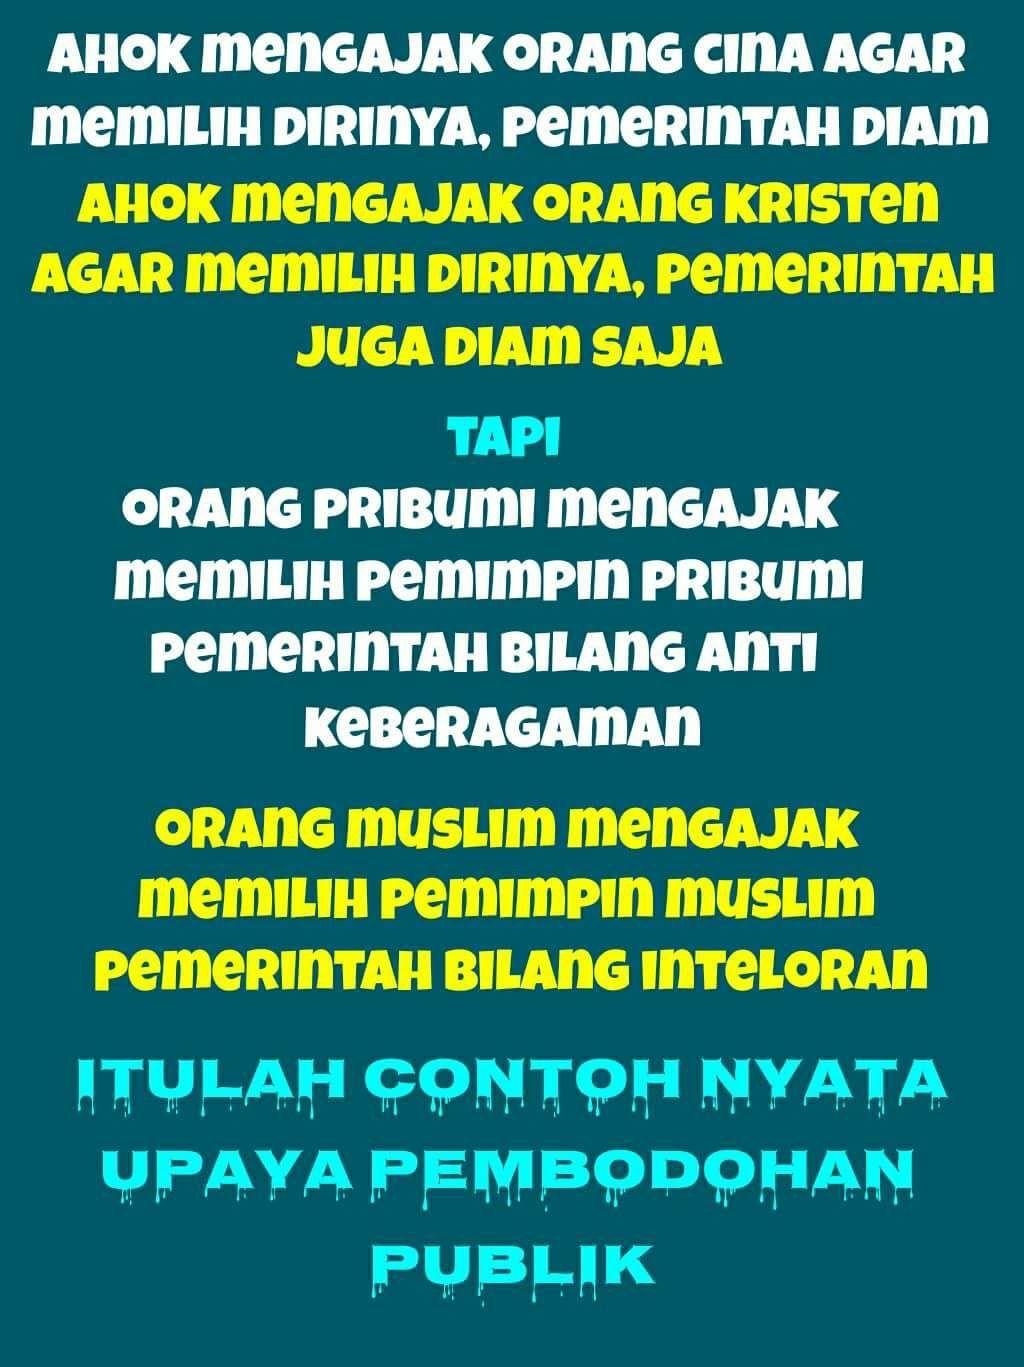 Pembodohan Publik Dystonesia Indonesia Pinterest